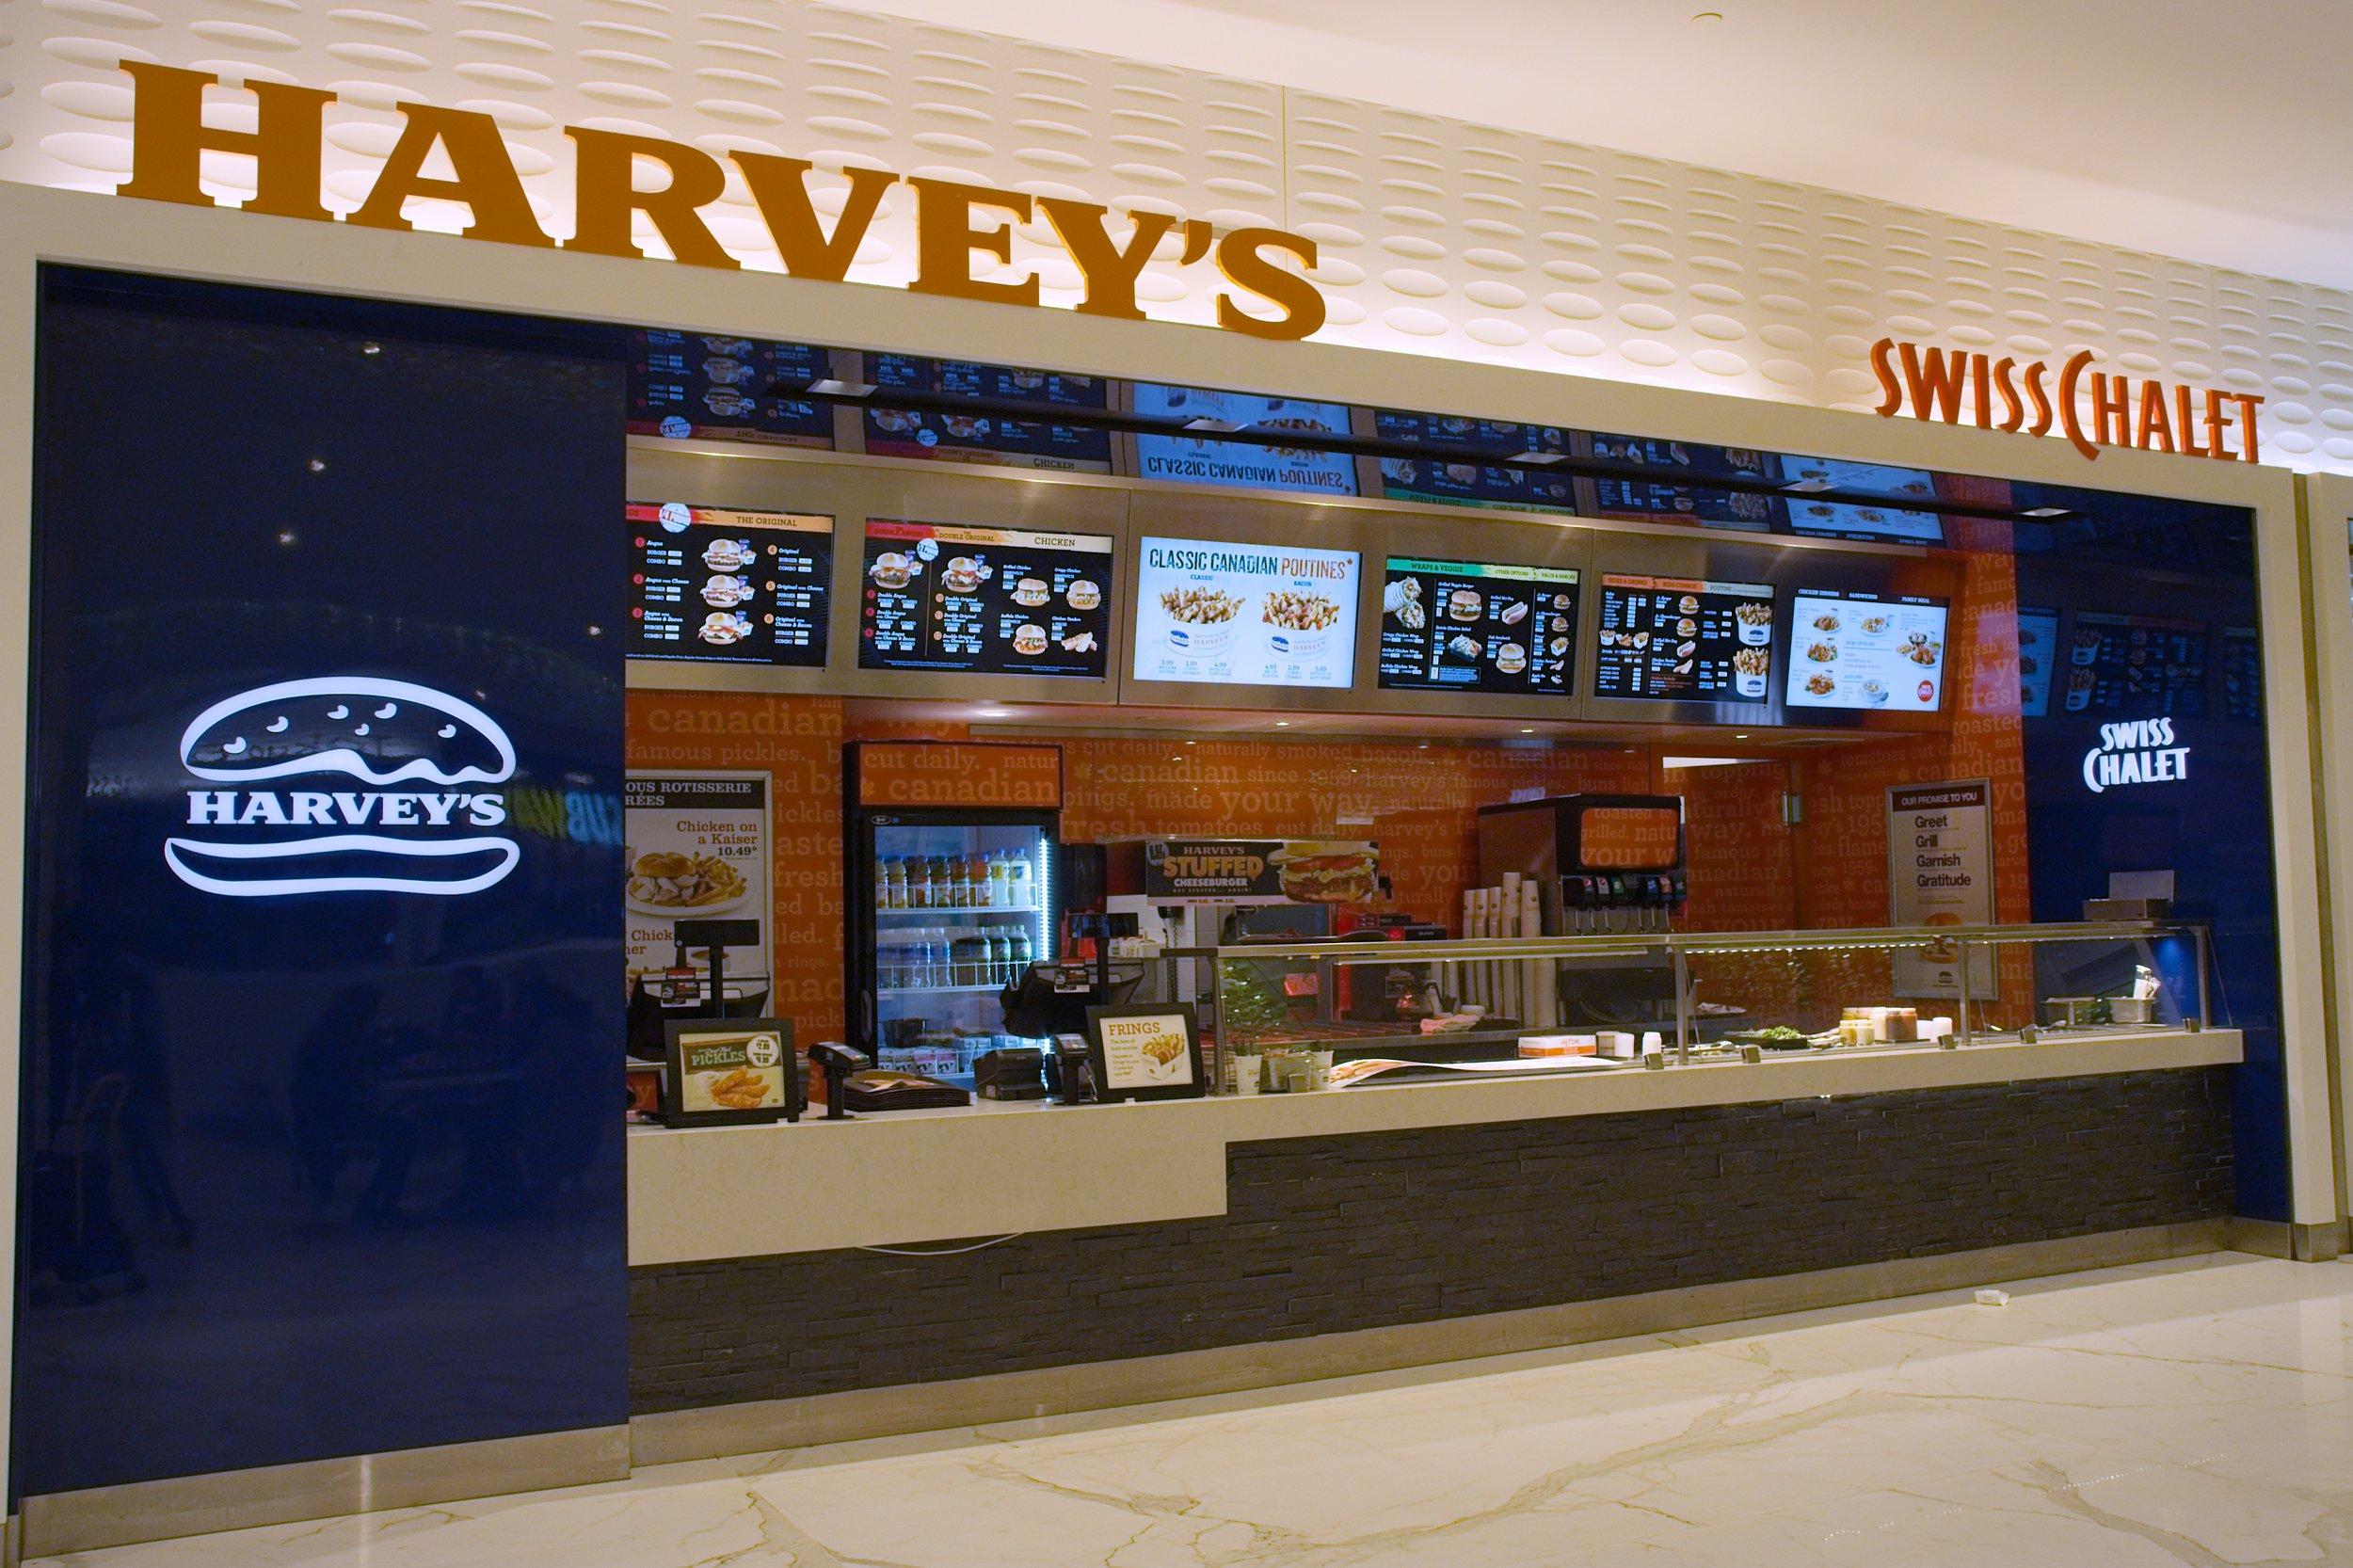 Harveys/Swiss Chalet